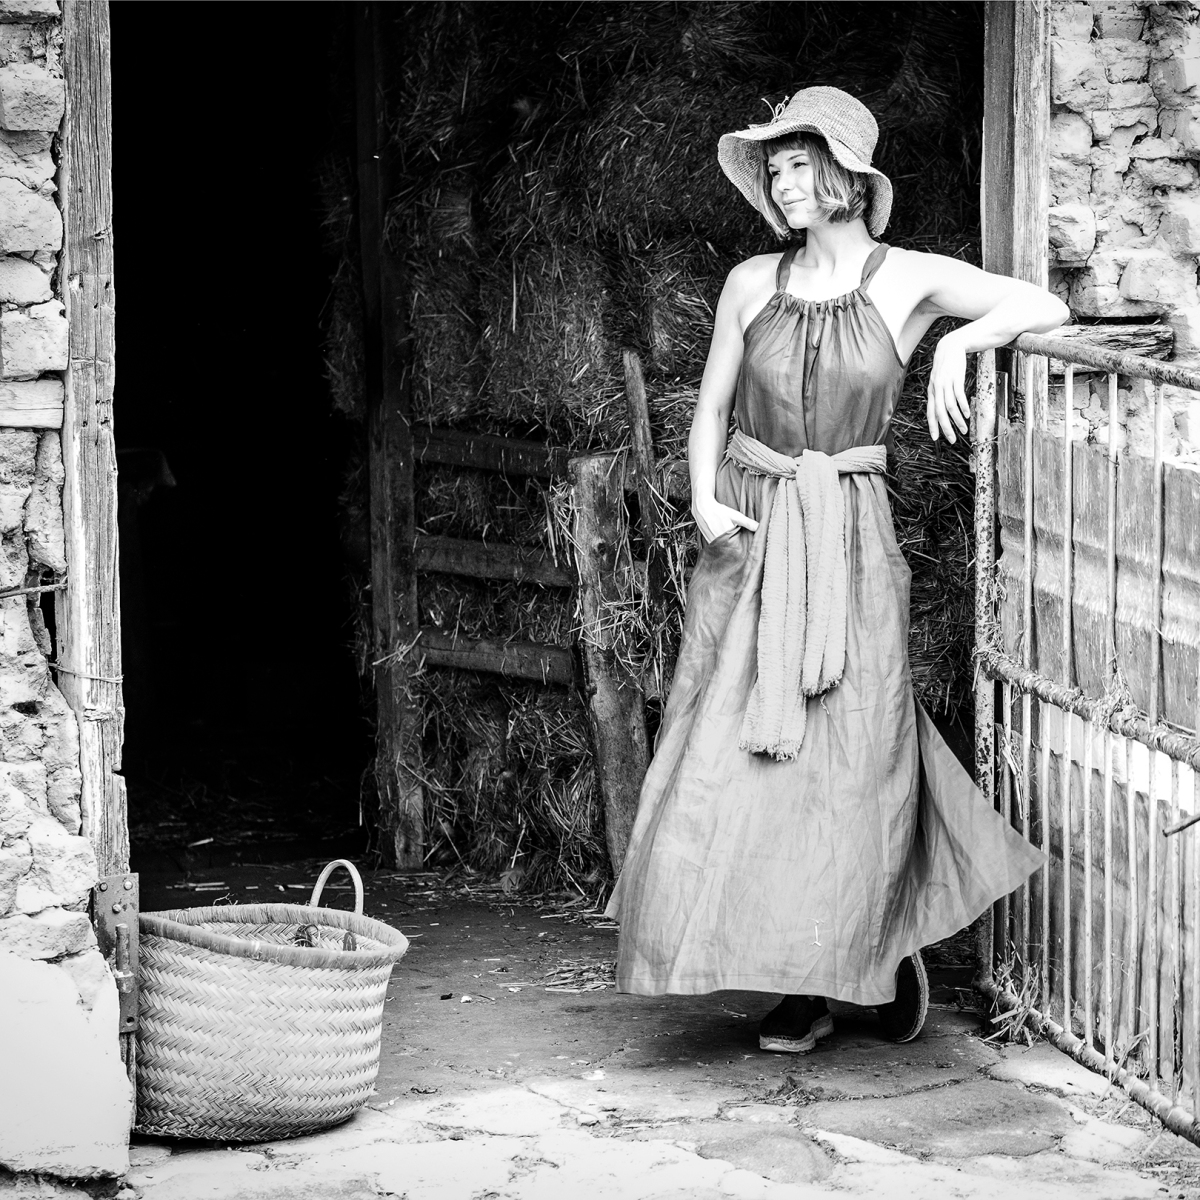 Photographer Susan Greeff, Always Summer Photography, Langebaan, Western Cape, South Africa